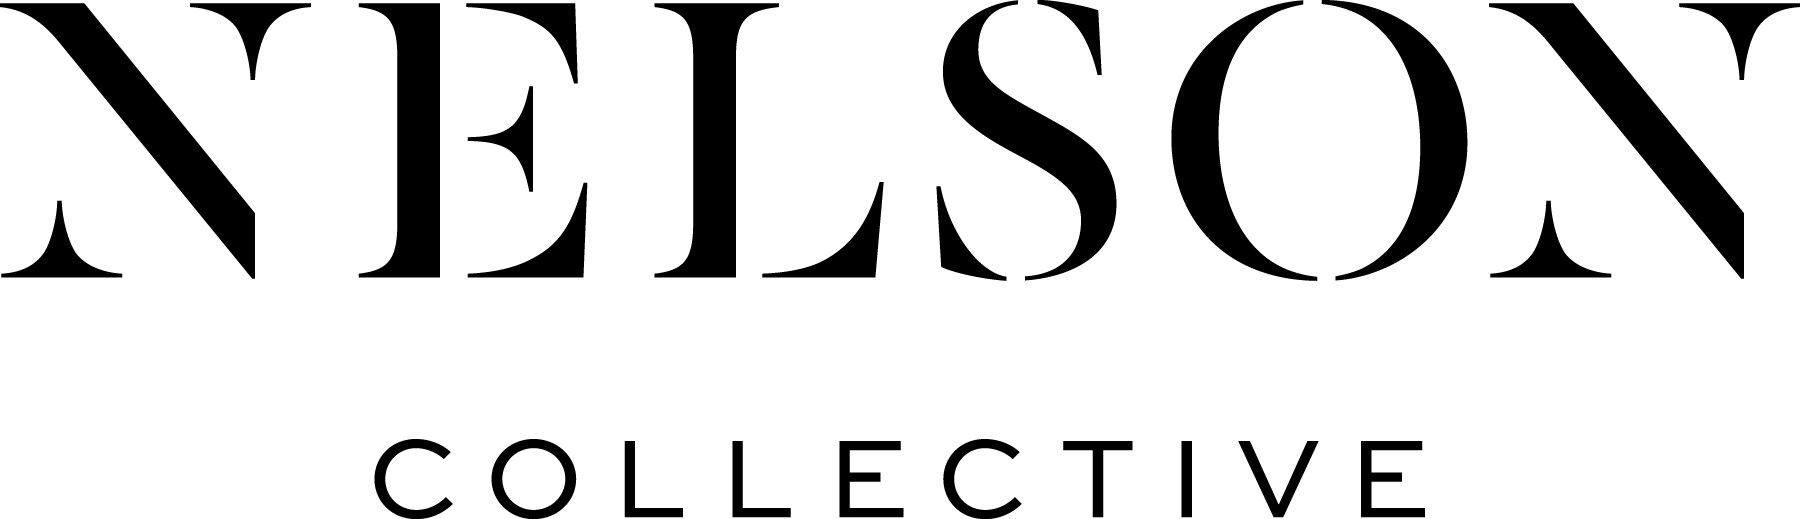 Nelson_Collective_logo_black_CMYK.jpg